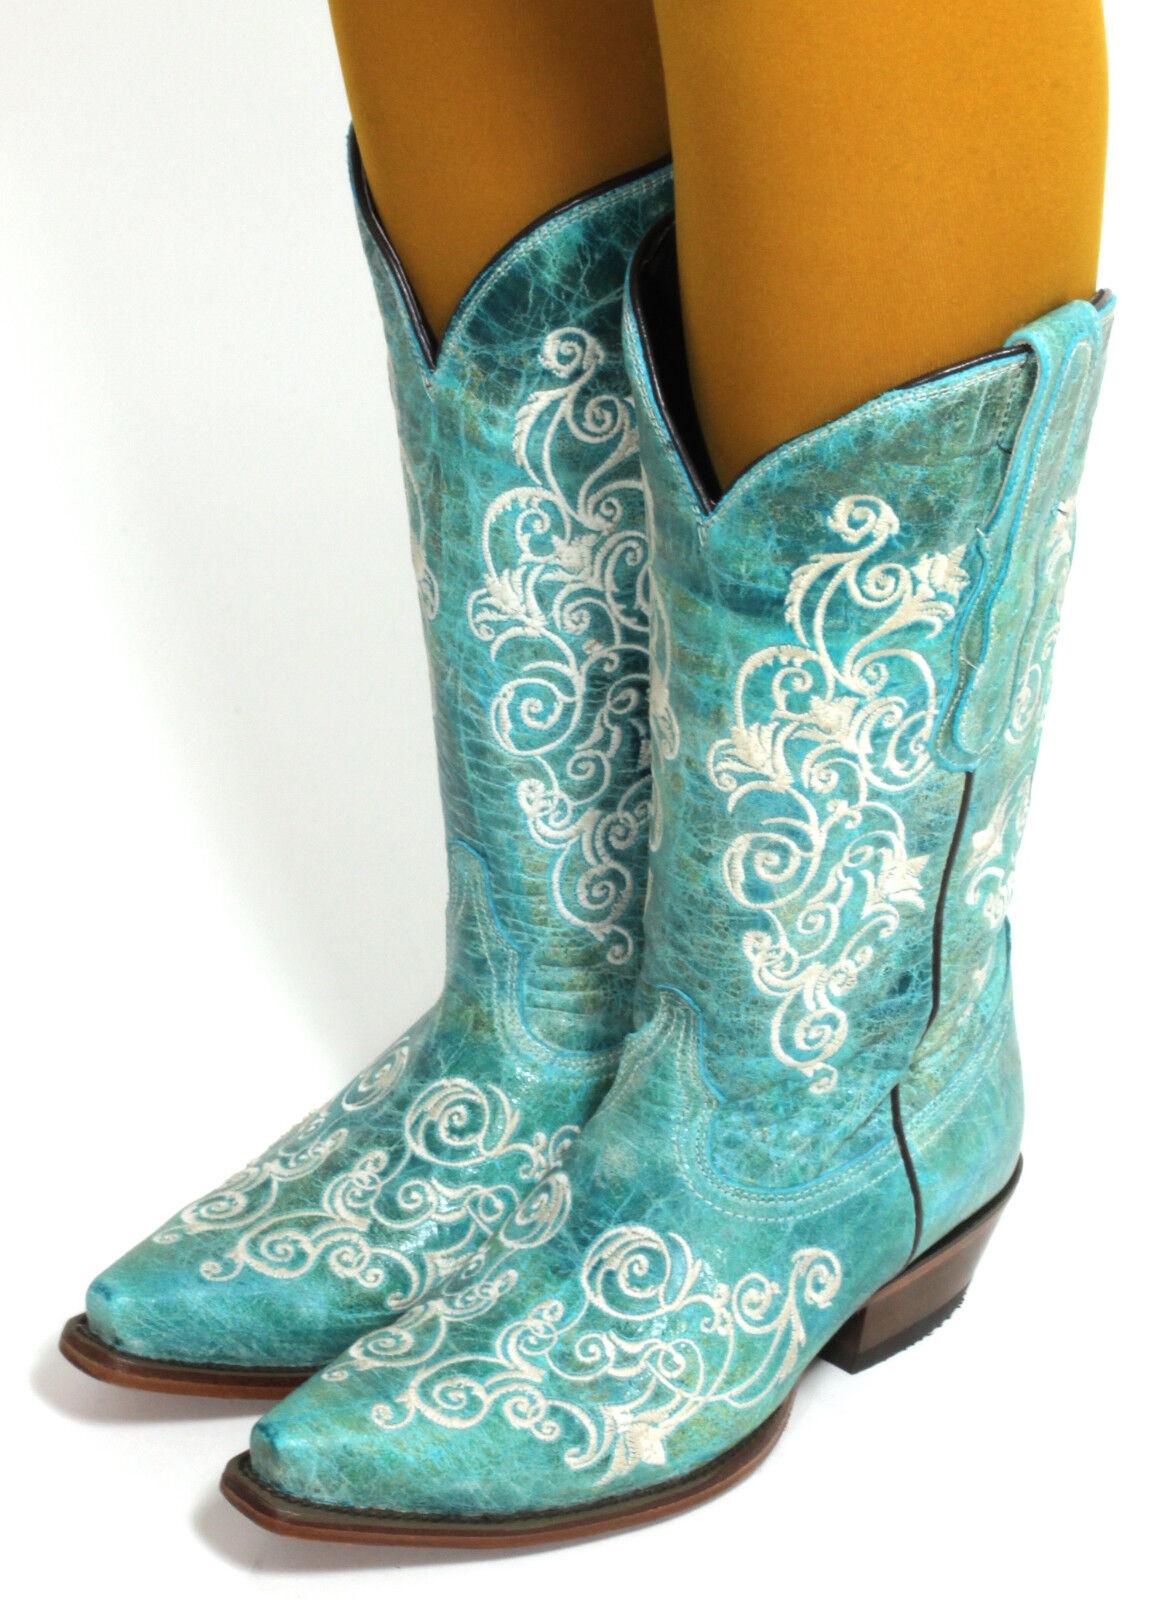 22 22 22 Bota Vaquera botas vaqueras botas estilo Texas paquete catalán de moda 41  varios tamaños